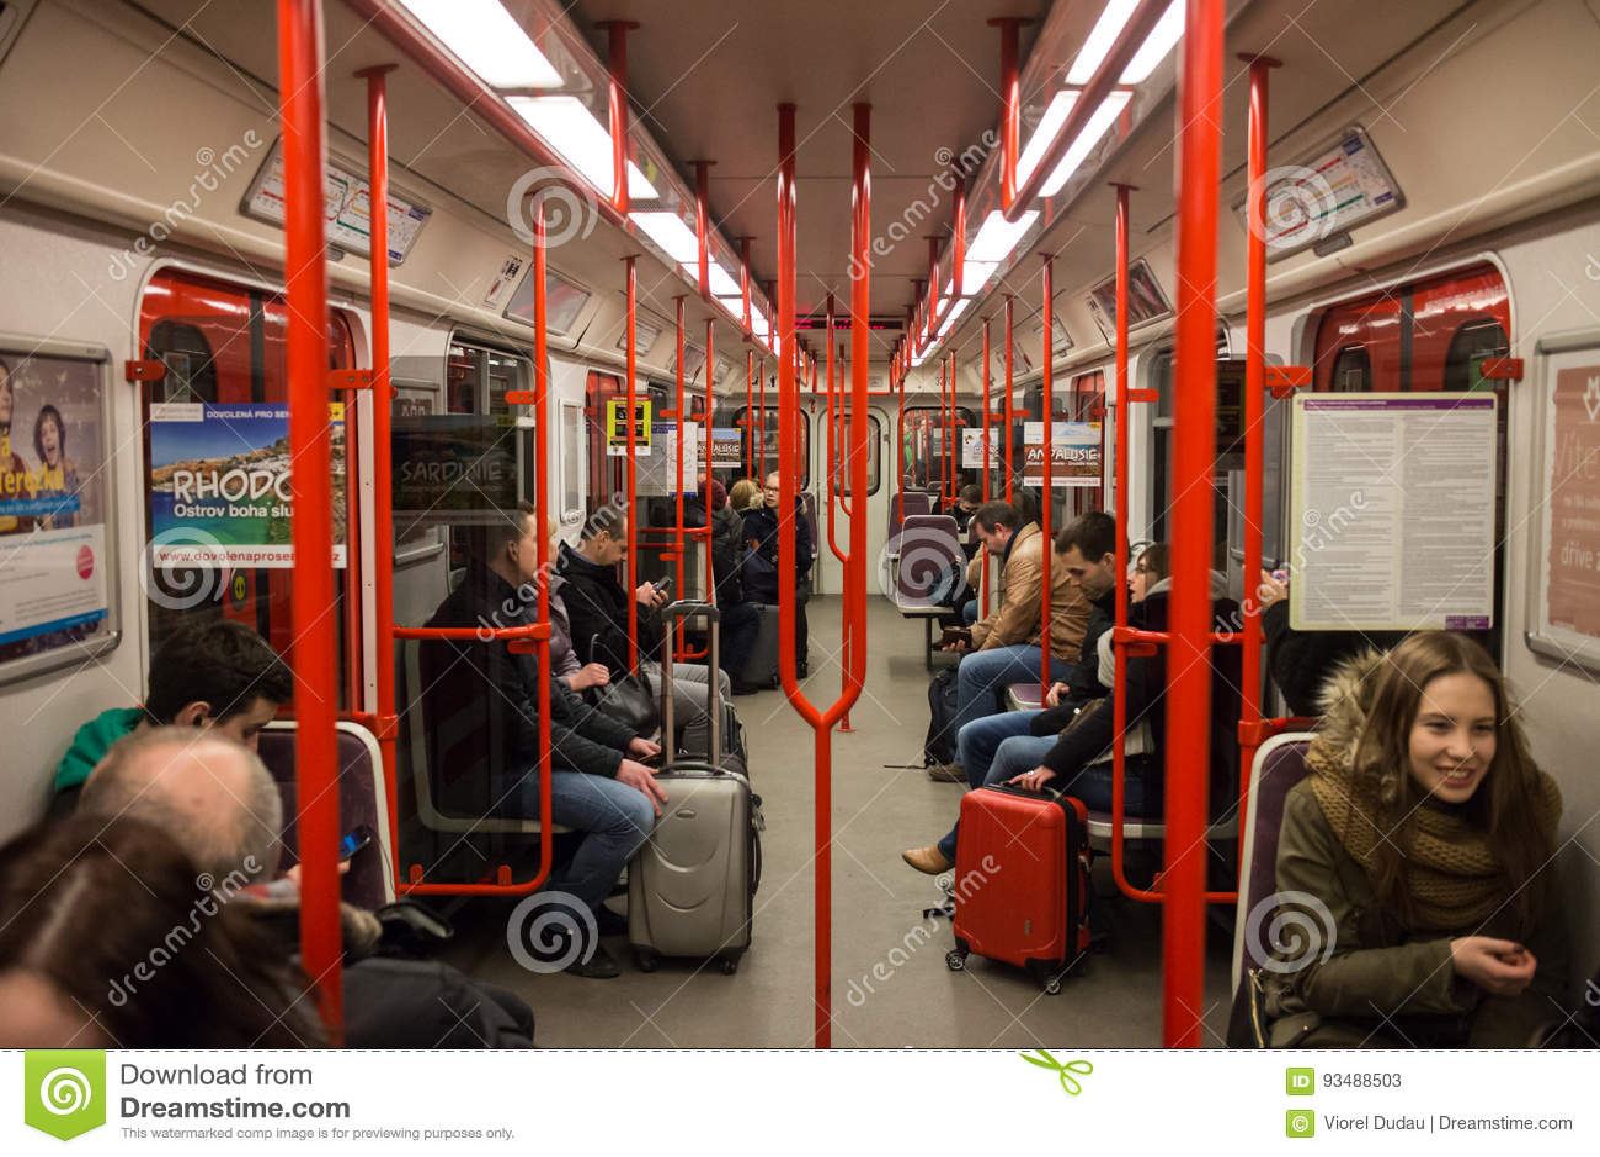 Passengers in subway train interior